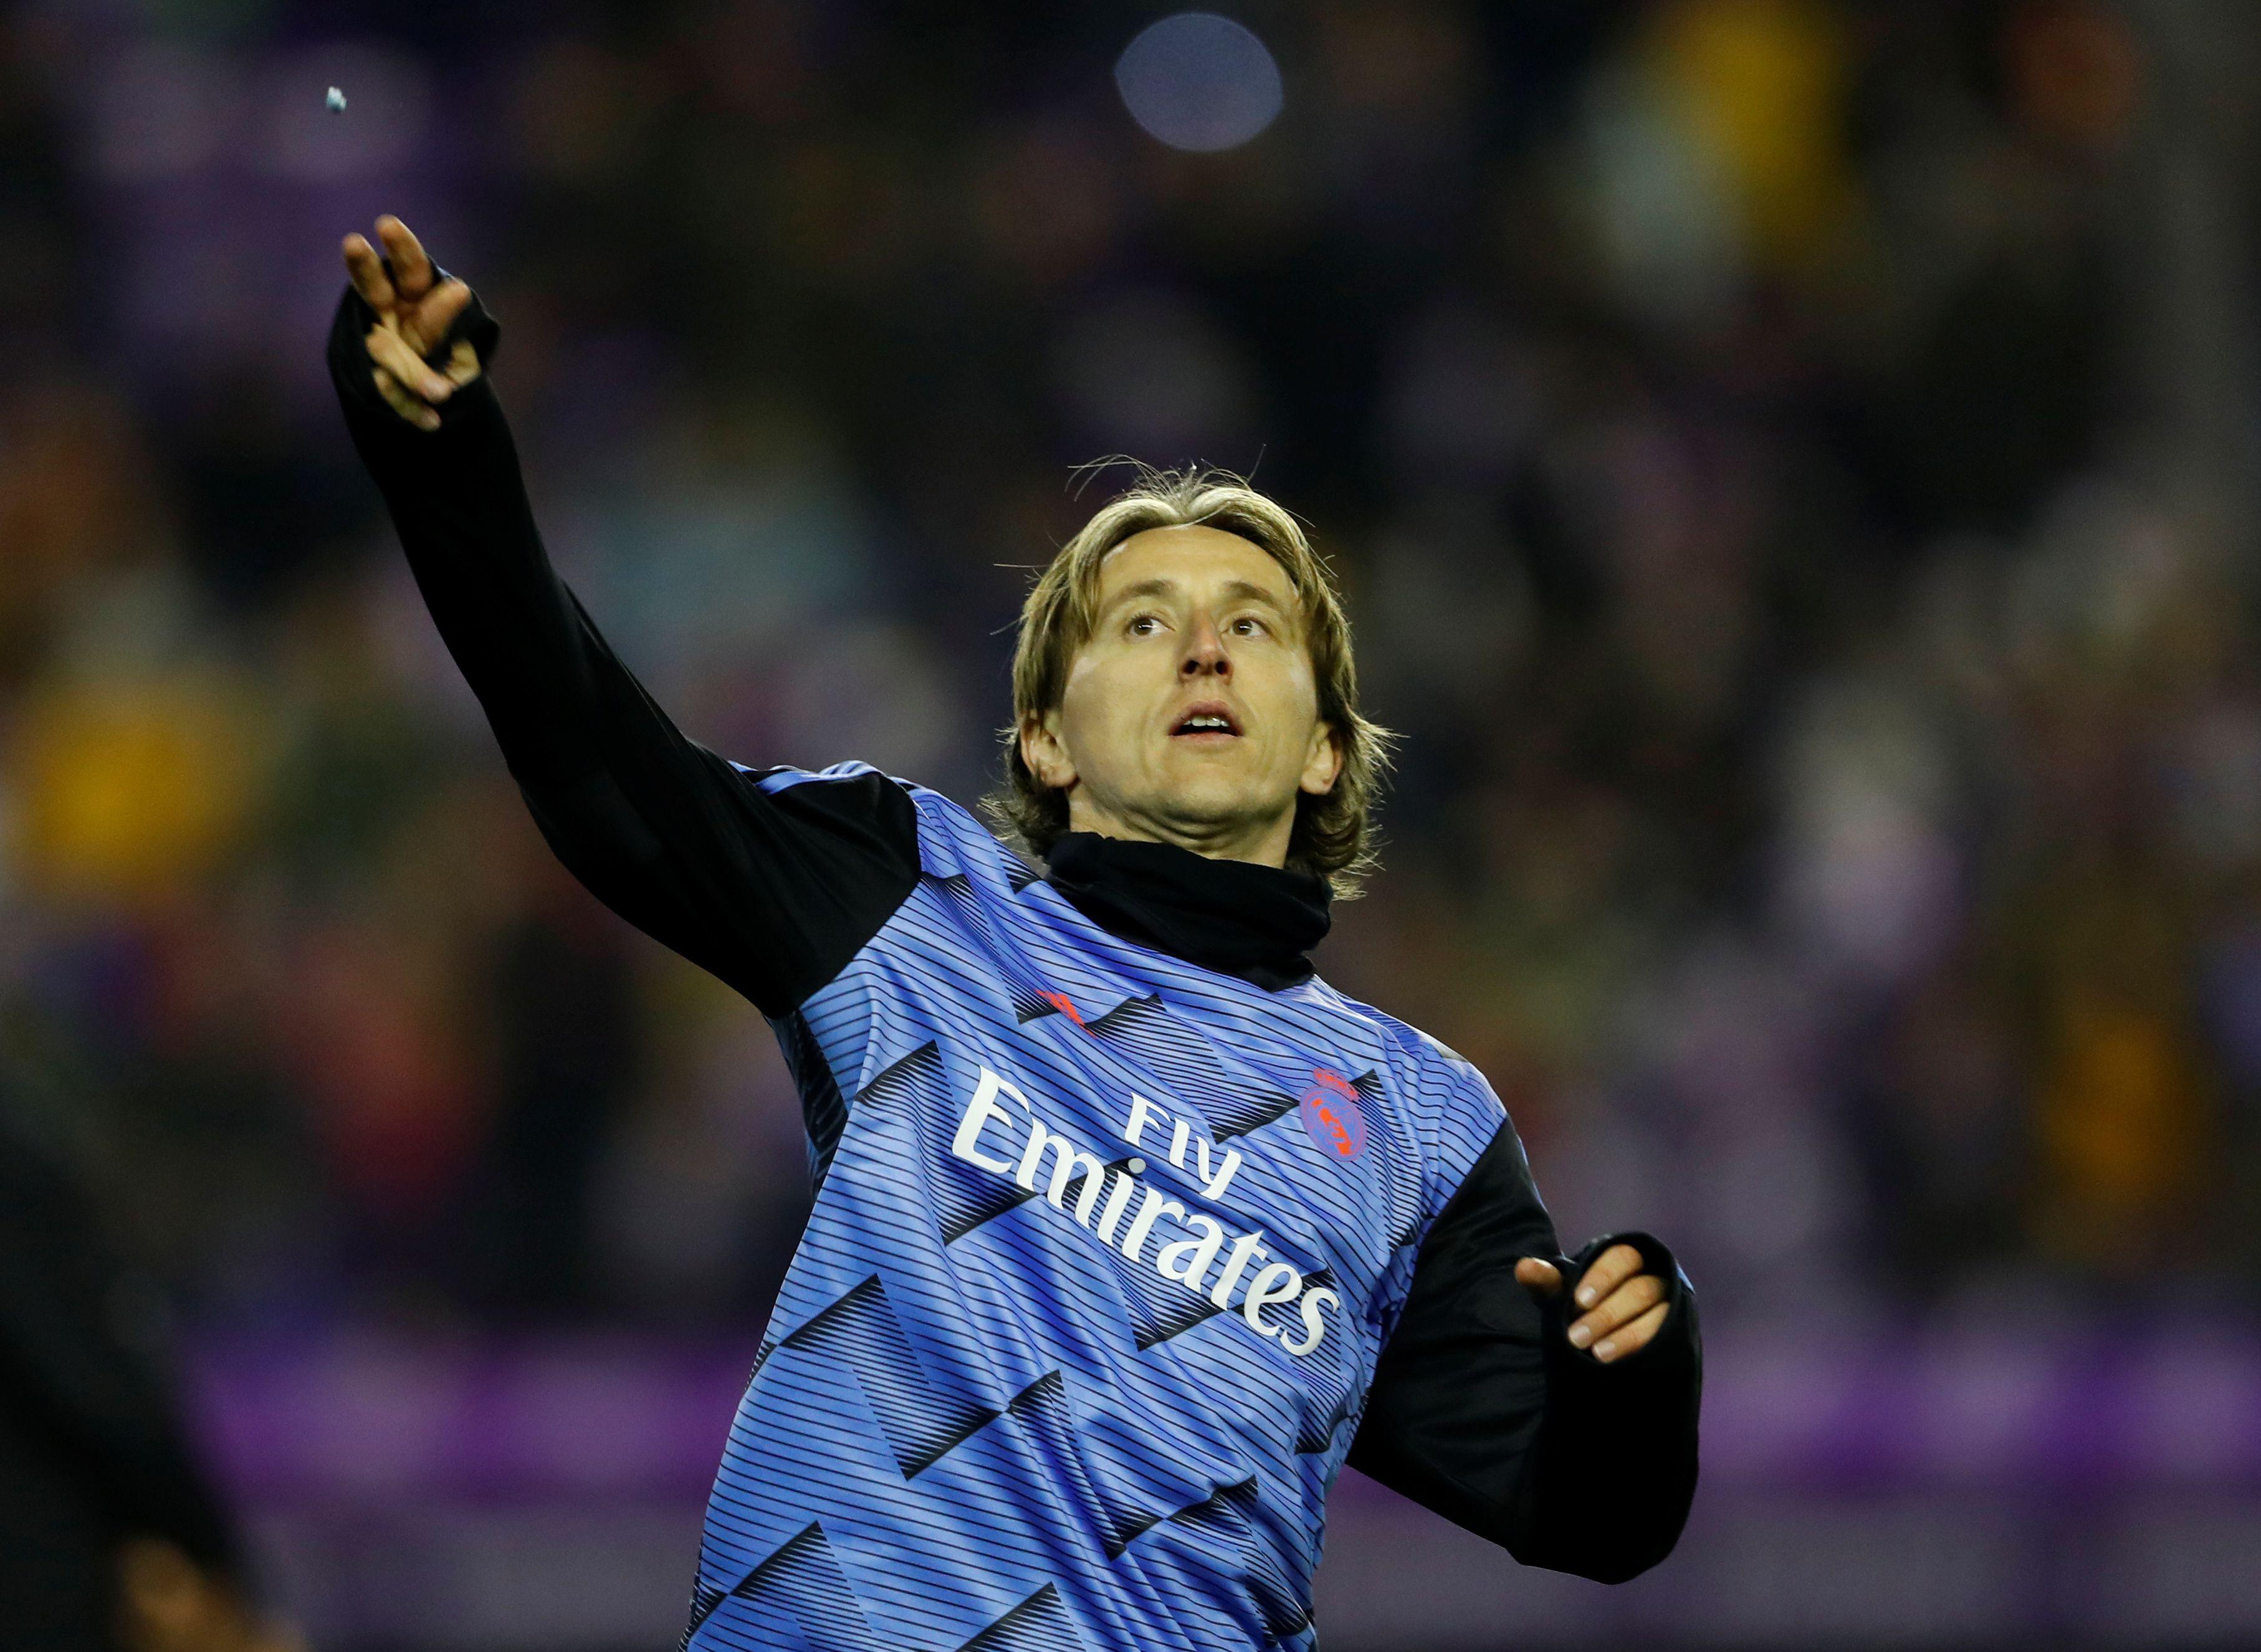 Luka Modric ha logrado triunfar pese a la adversidad (Reuetrs)